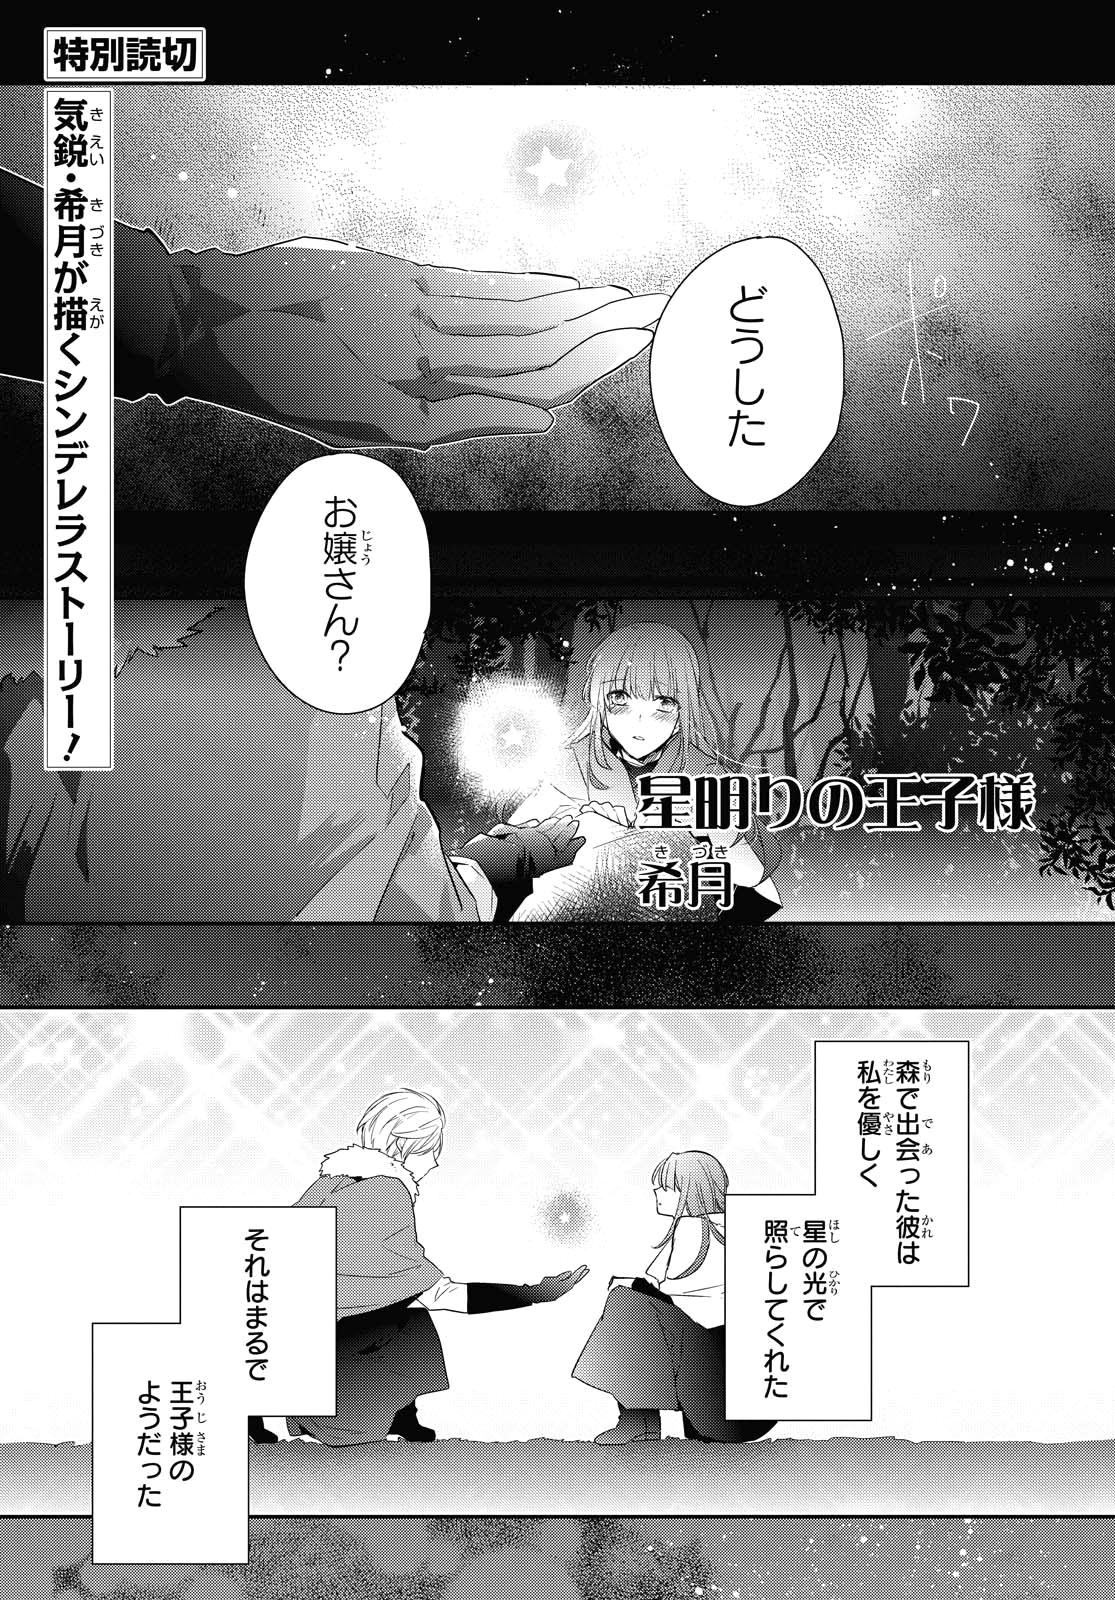 The Starlight Prince